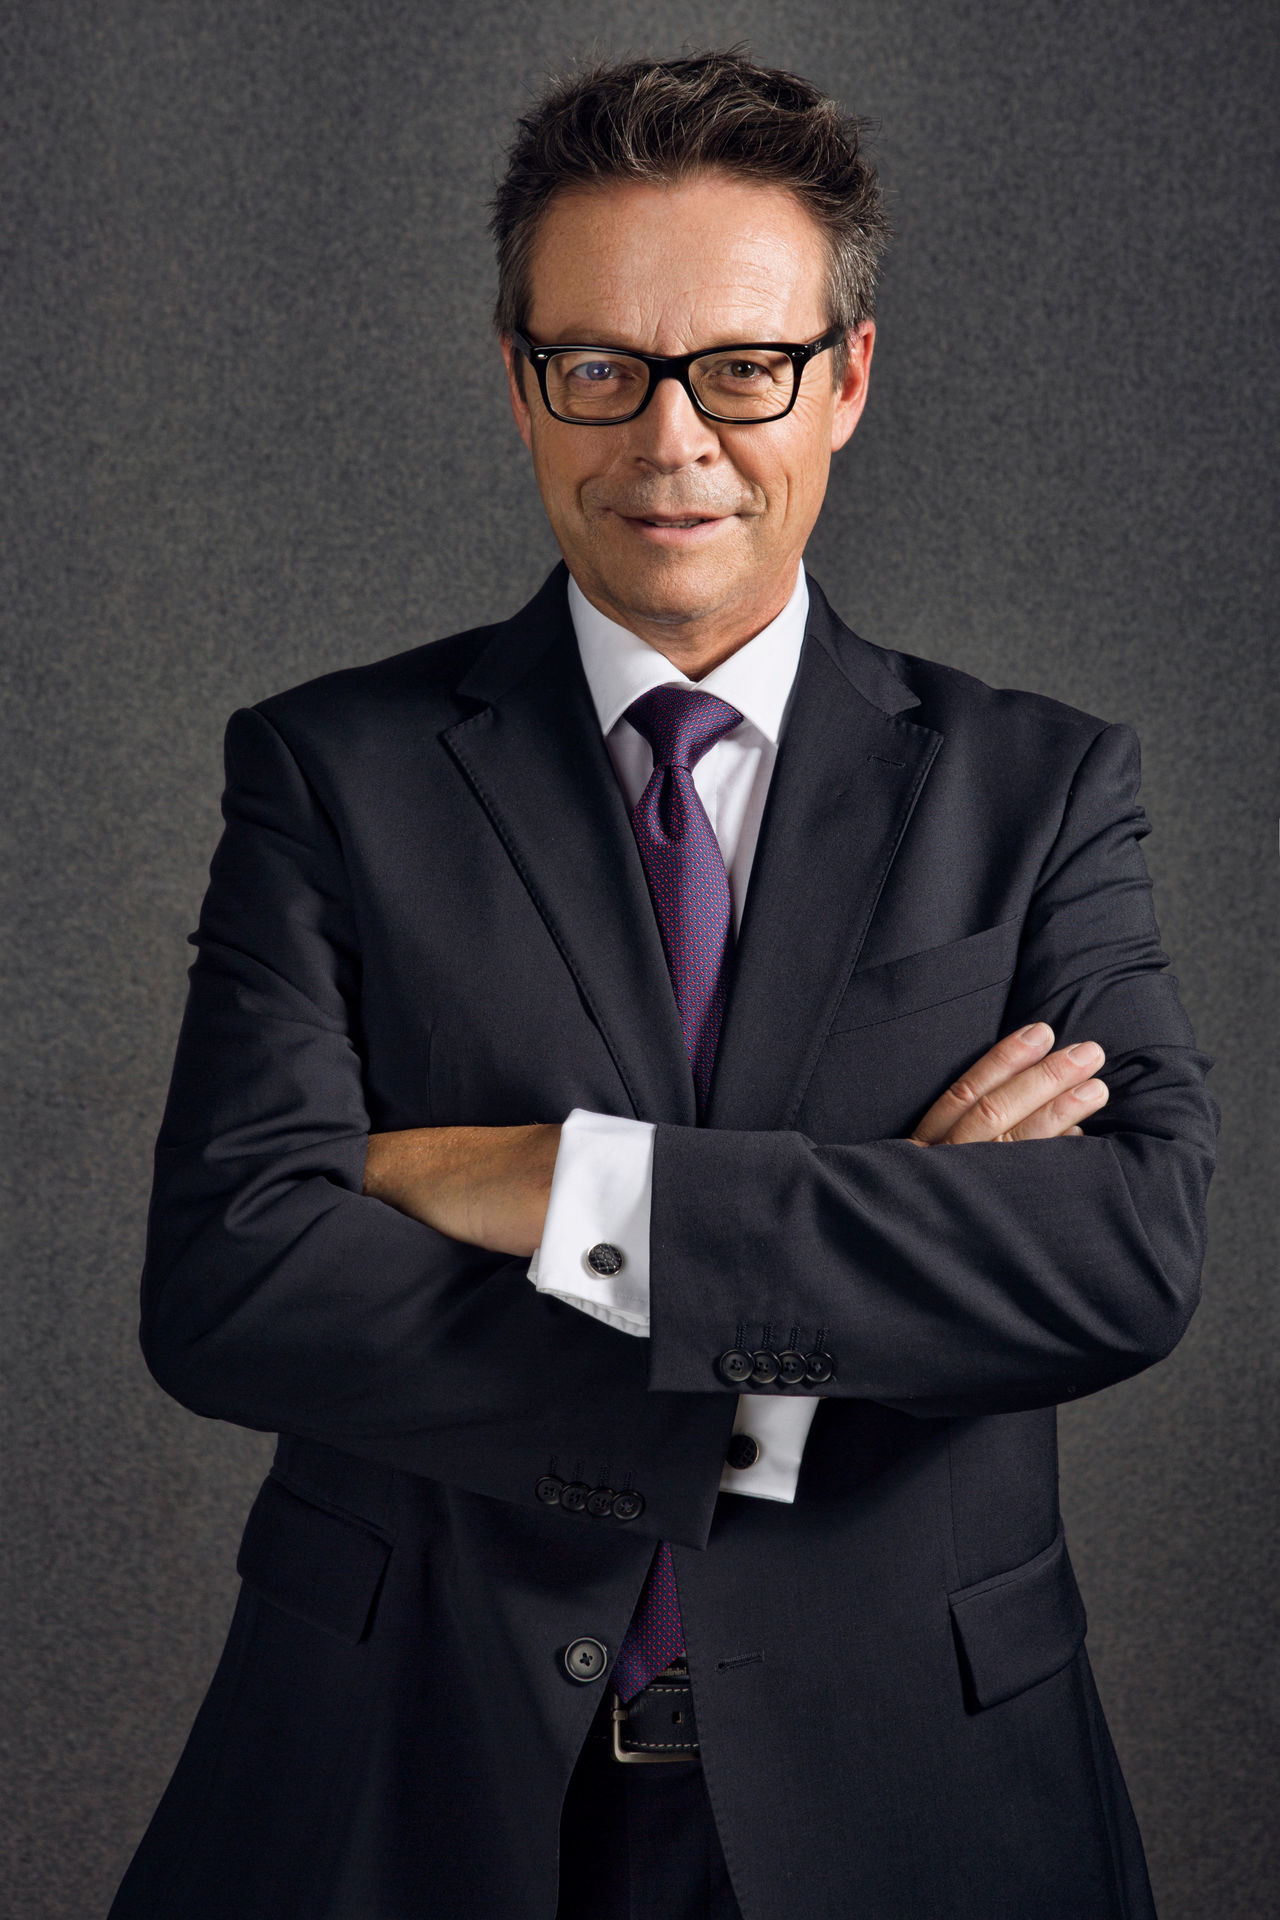 Michael-Julius Renz becomes head of Audi Sport GmbH